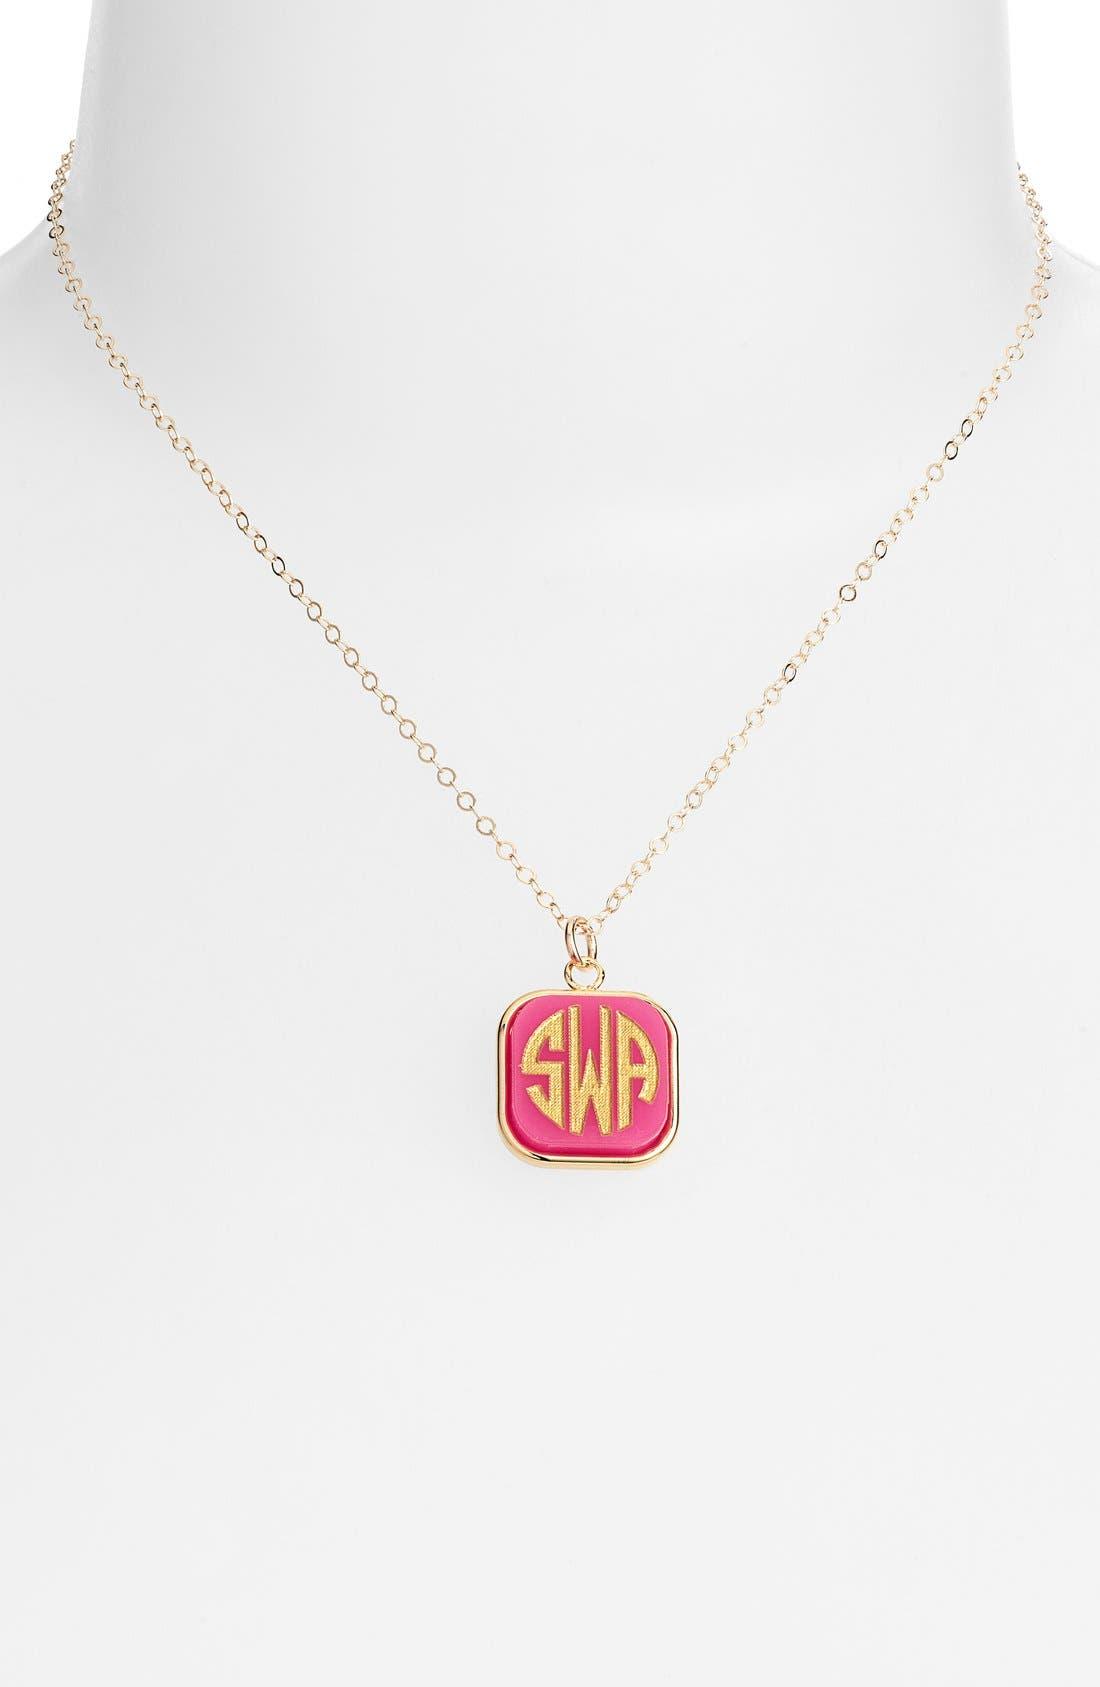 'Vineyard' Personalized Monogram Pendant Necklace,                             Alternate thumbnail 2, color,                             HOT PINK